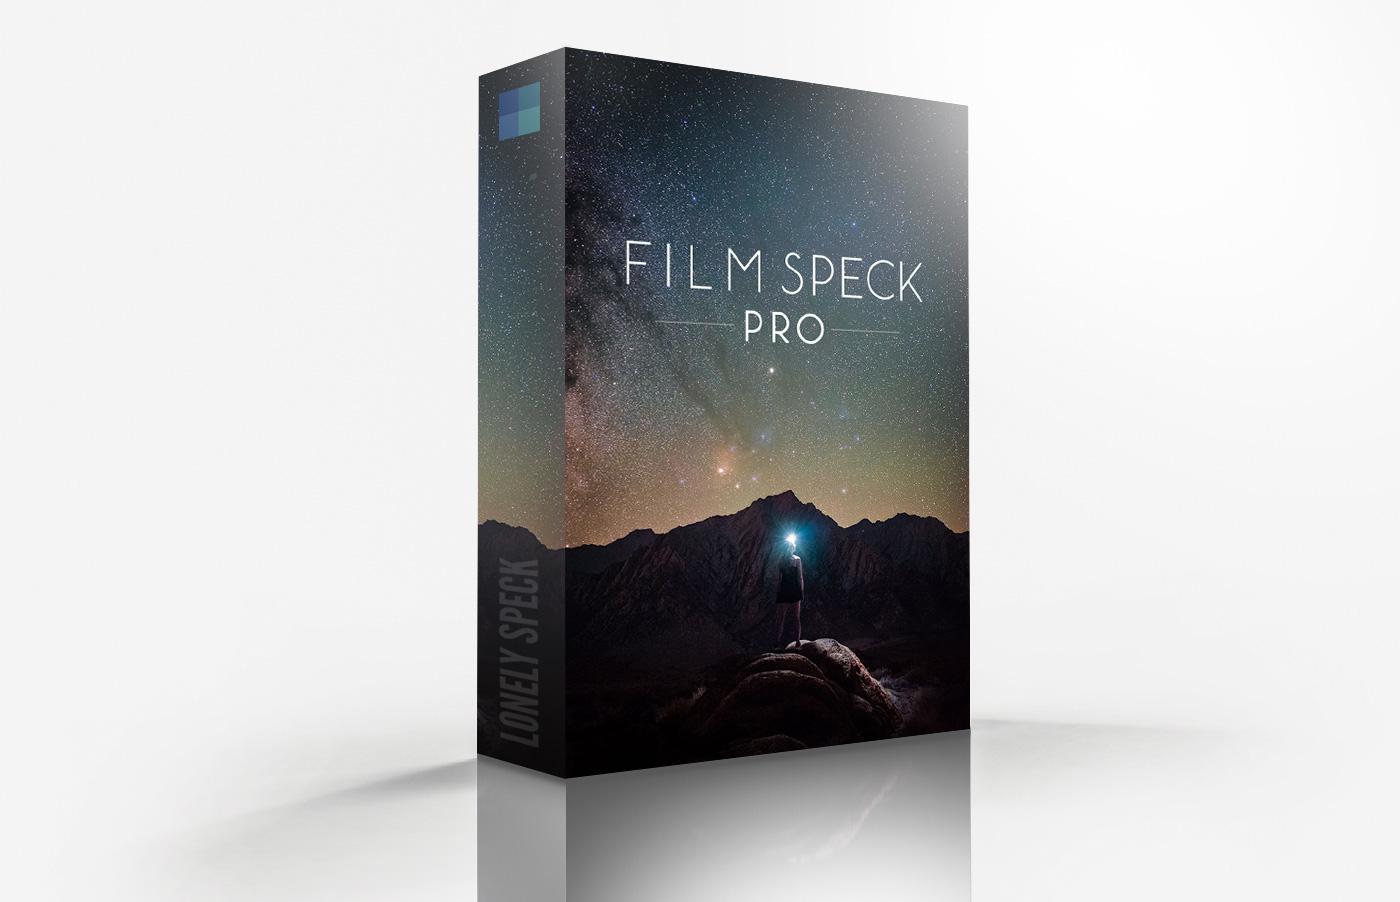 Film Speck Pro: Premium Lightroom Presets by Lonely Speck